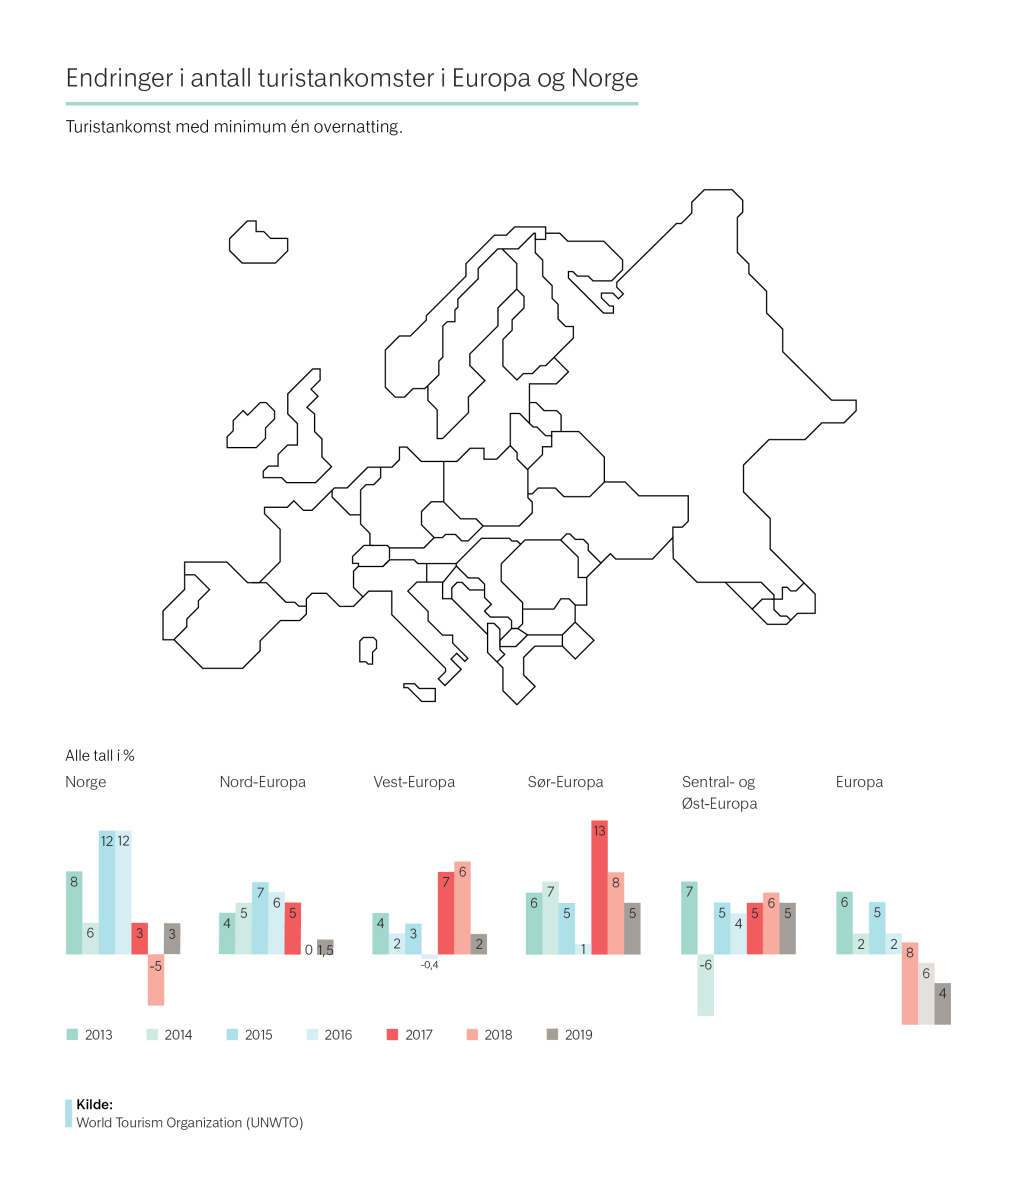 Endringer i antall turistankomster i Europa og Norge